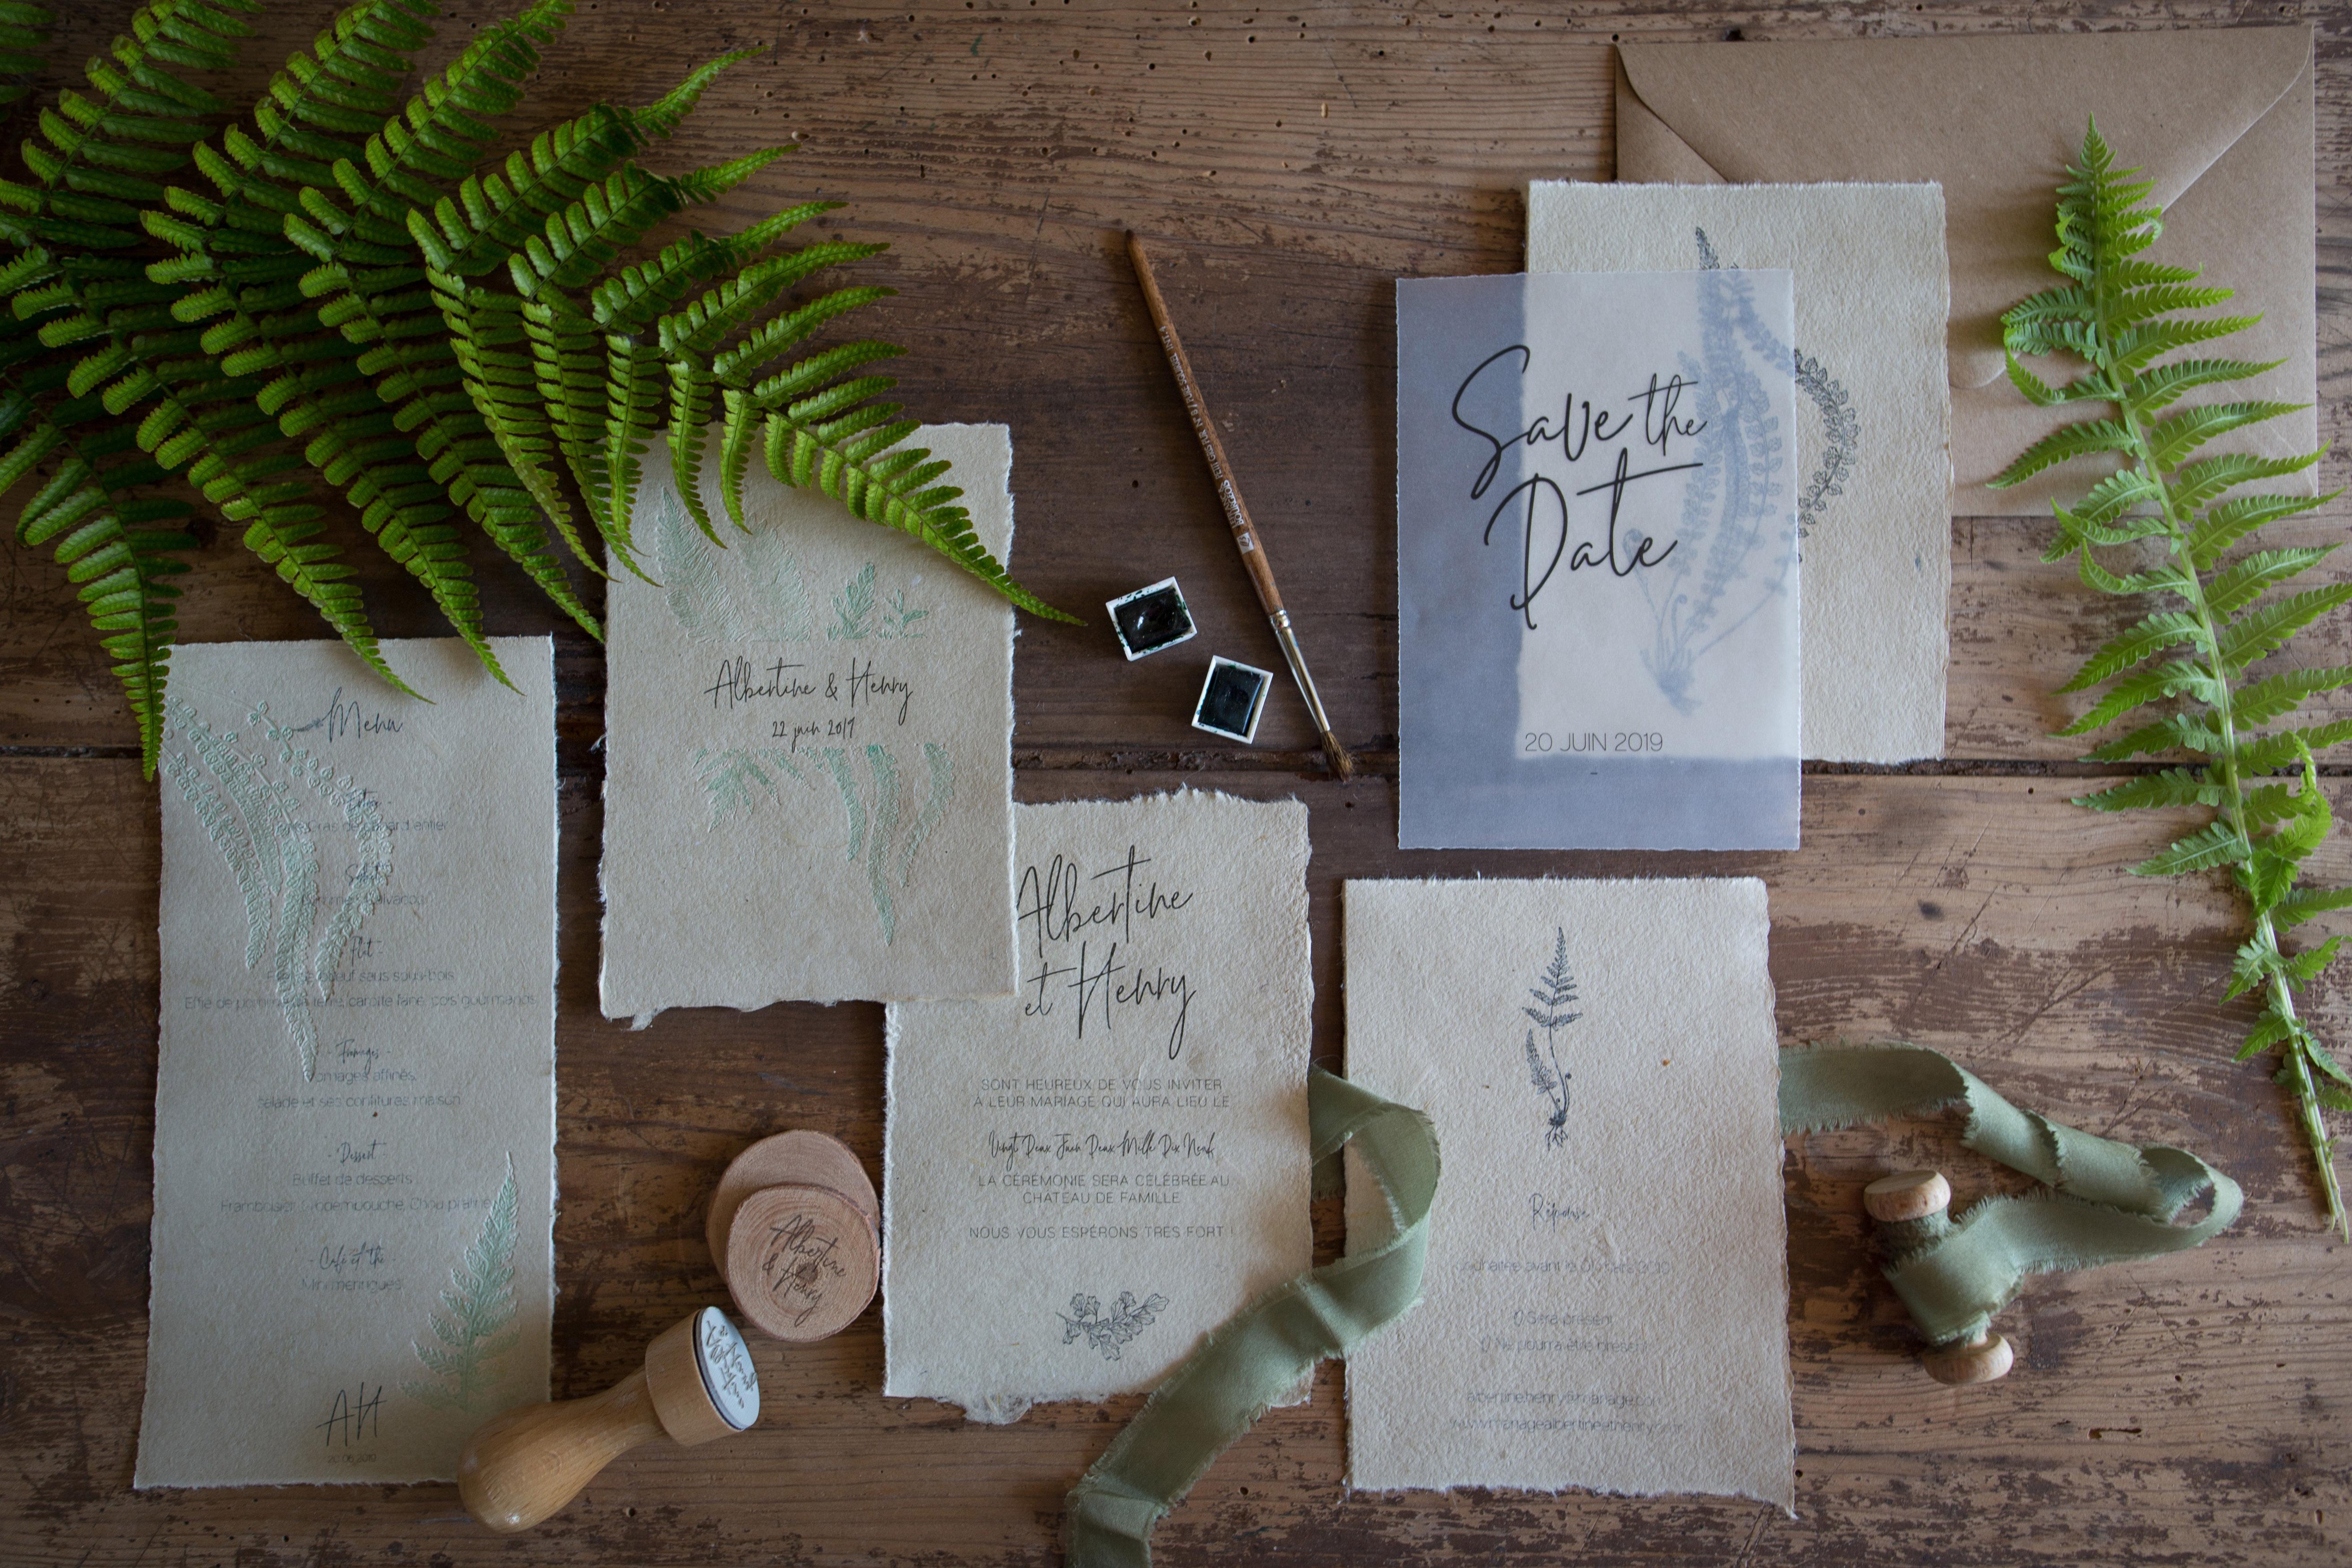 Collection fougère, faire-part, save the date, invitation, tampon, spiritus naturae-1